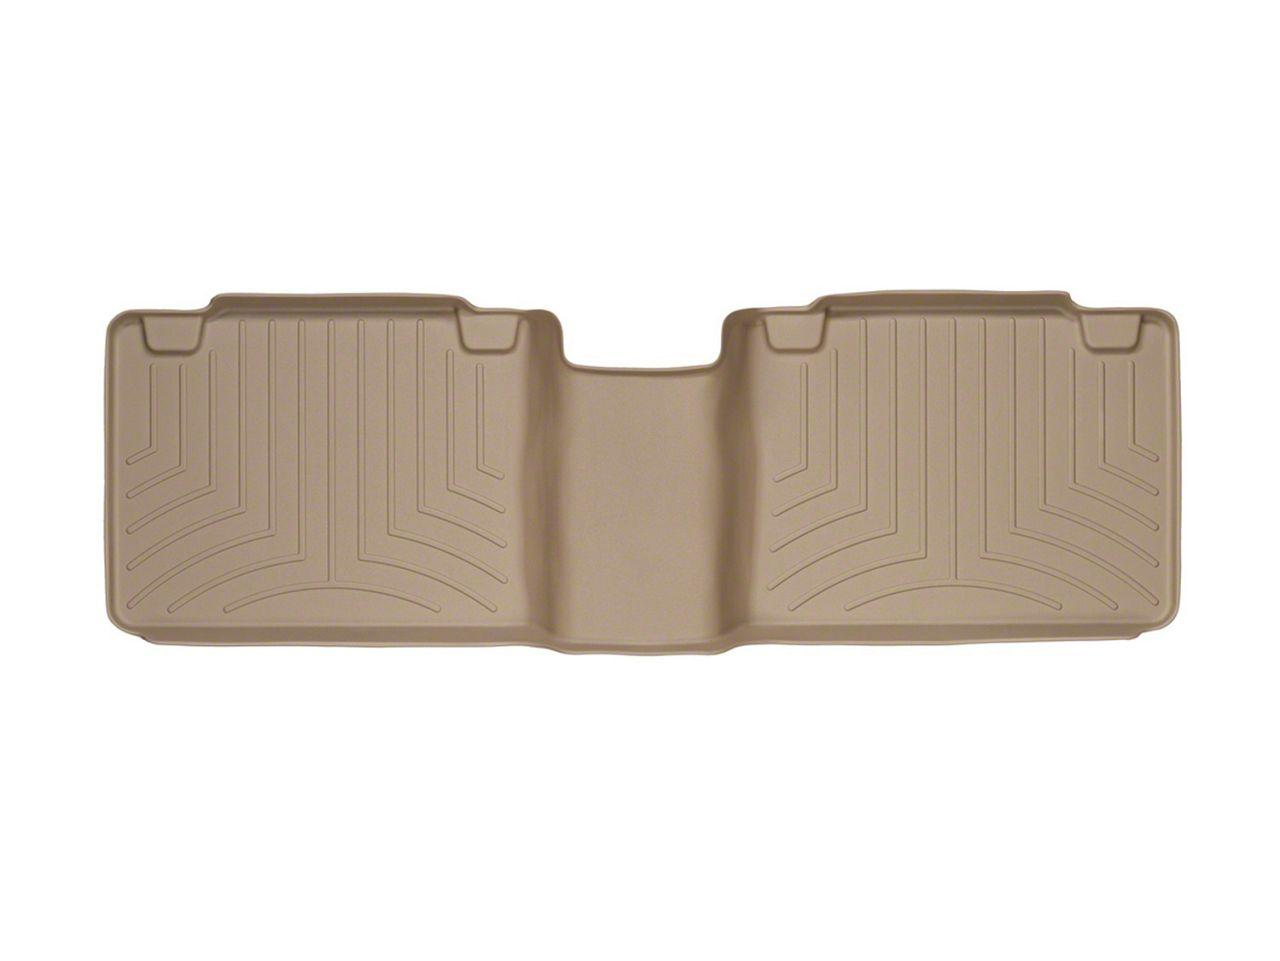 Weathertech DigitalFit Rear Floor Liner - Tan (05-19 Tacoma Access Cab)